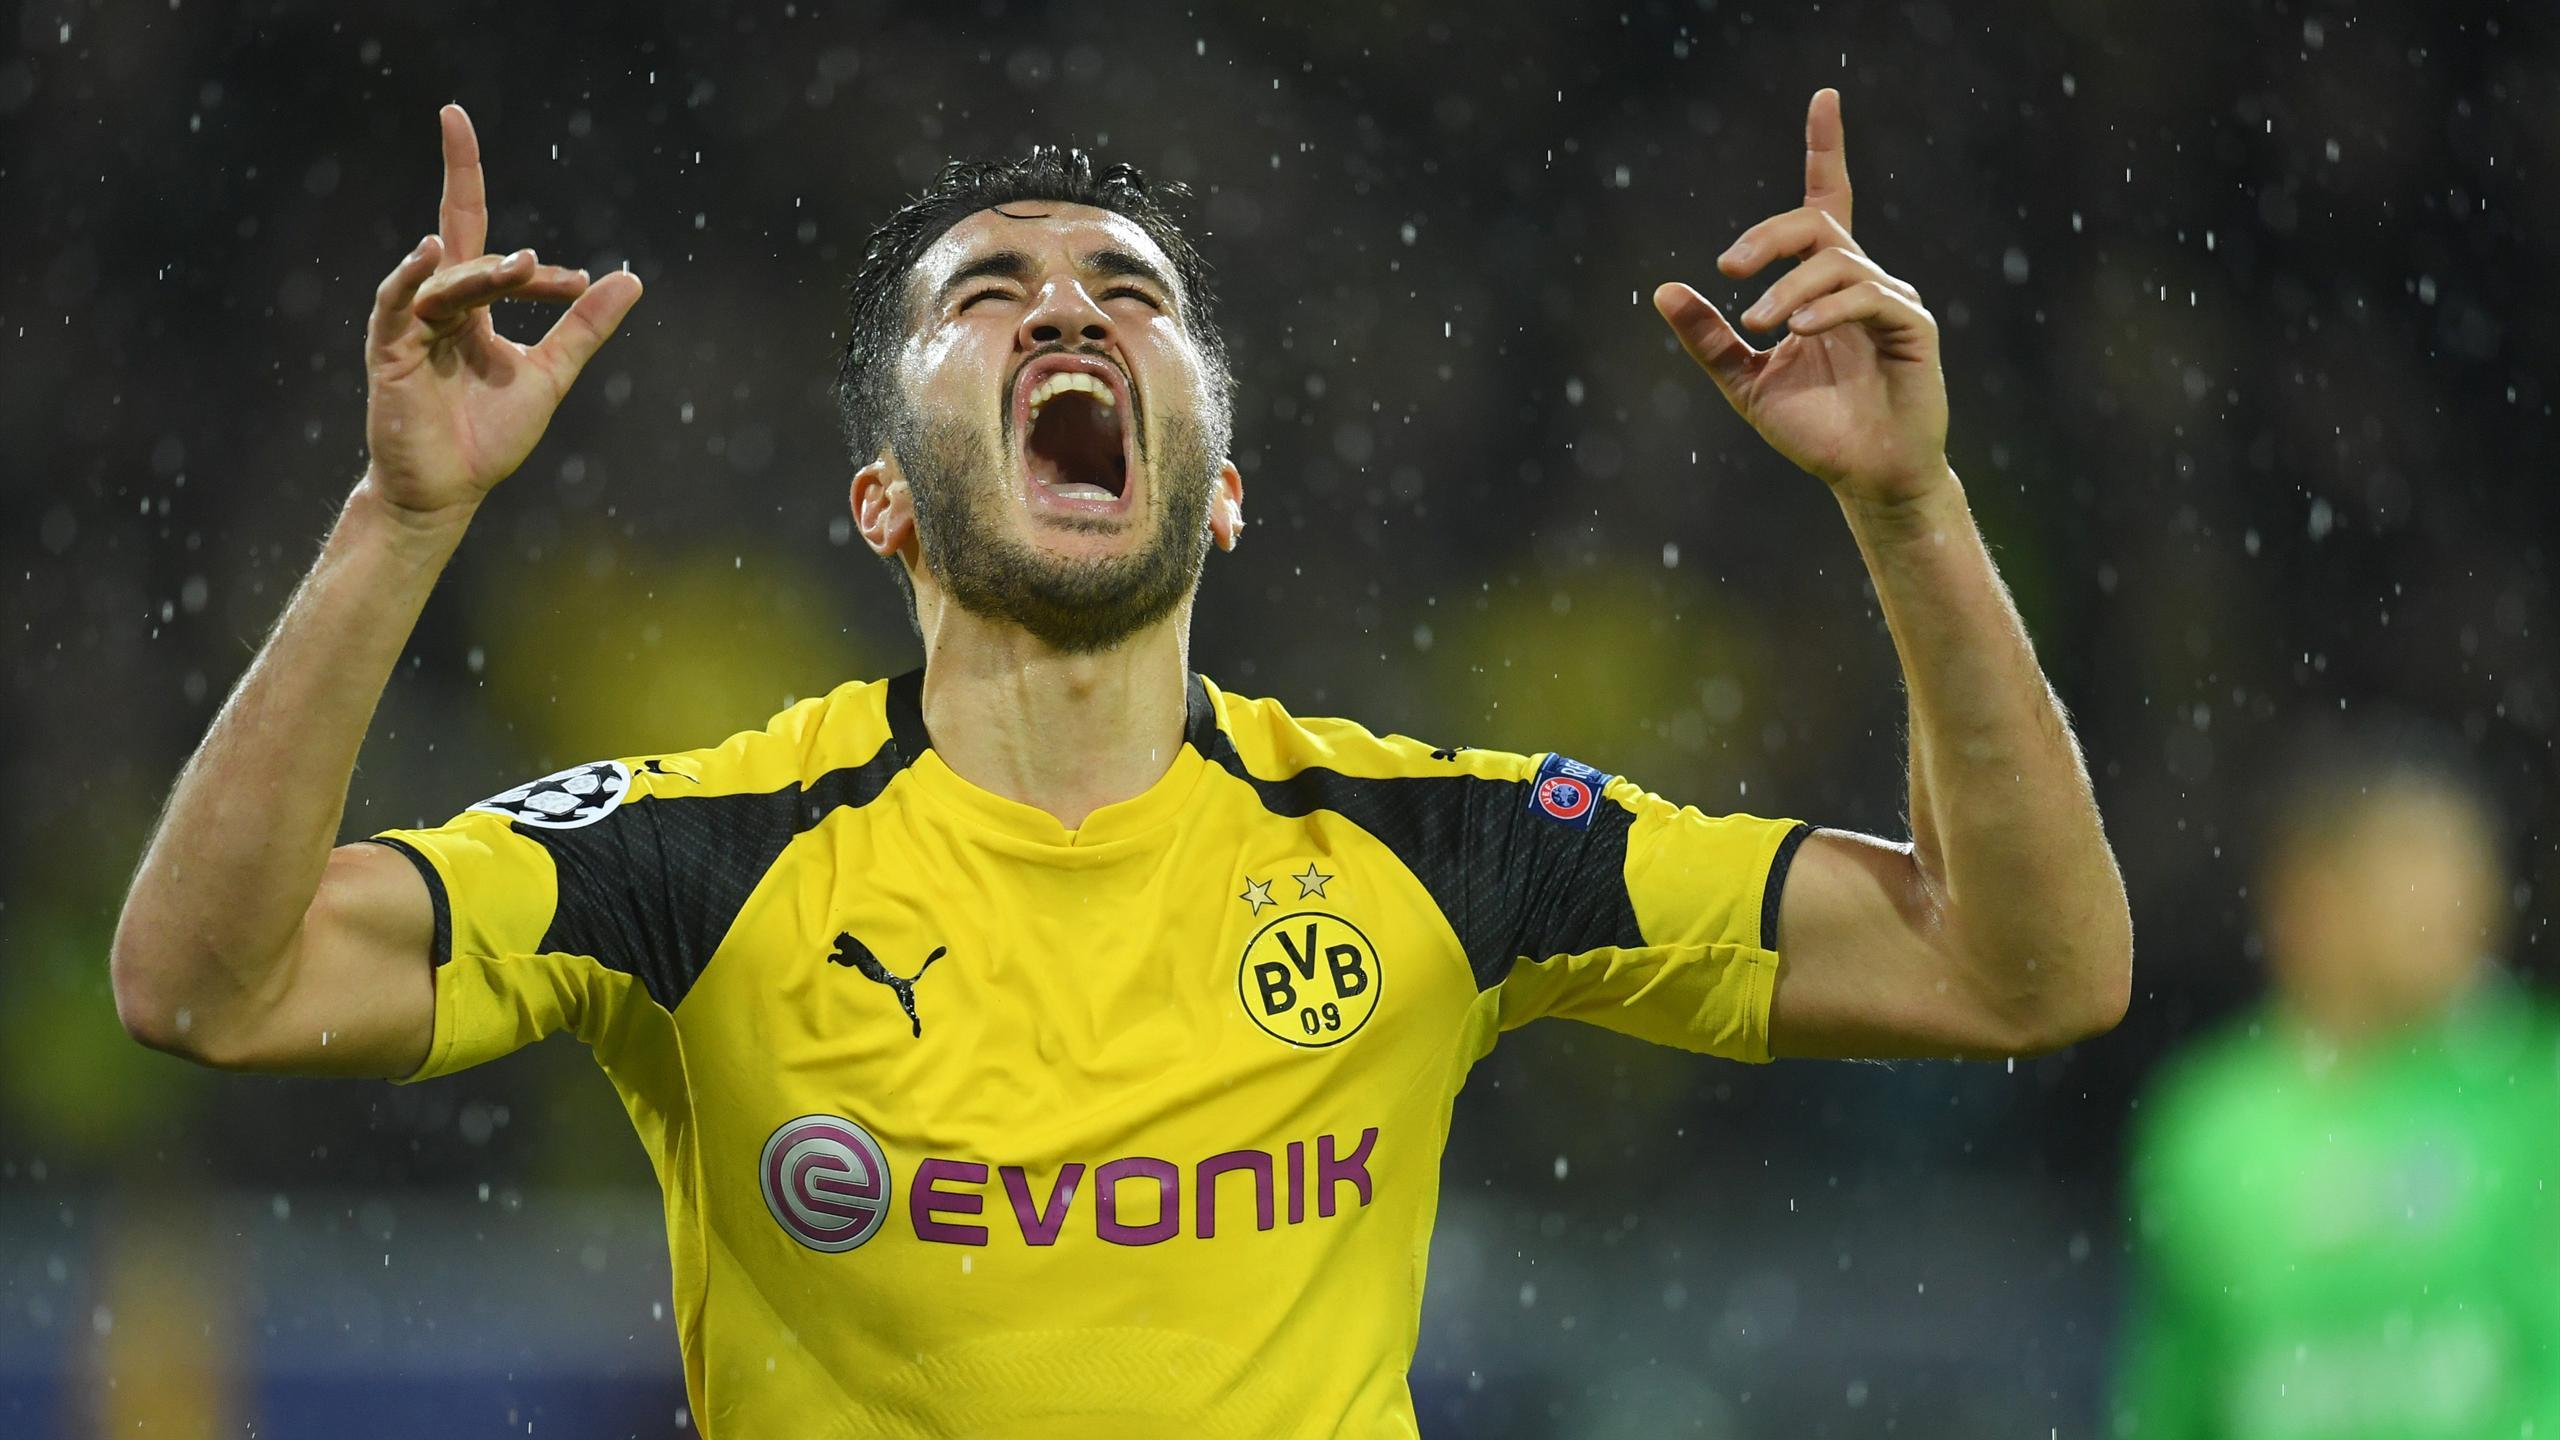 Nuri Sahin (Borussia Dortmund)